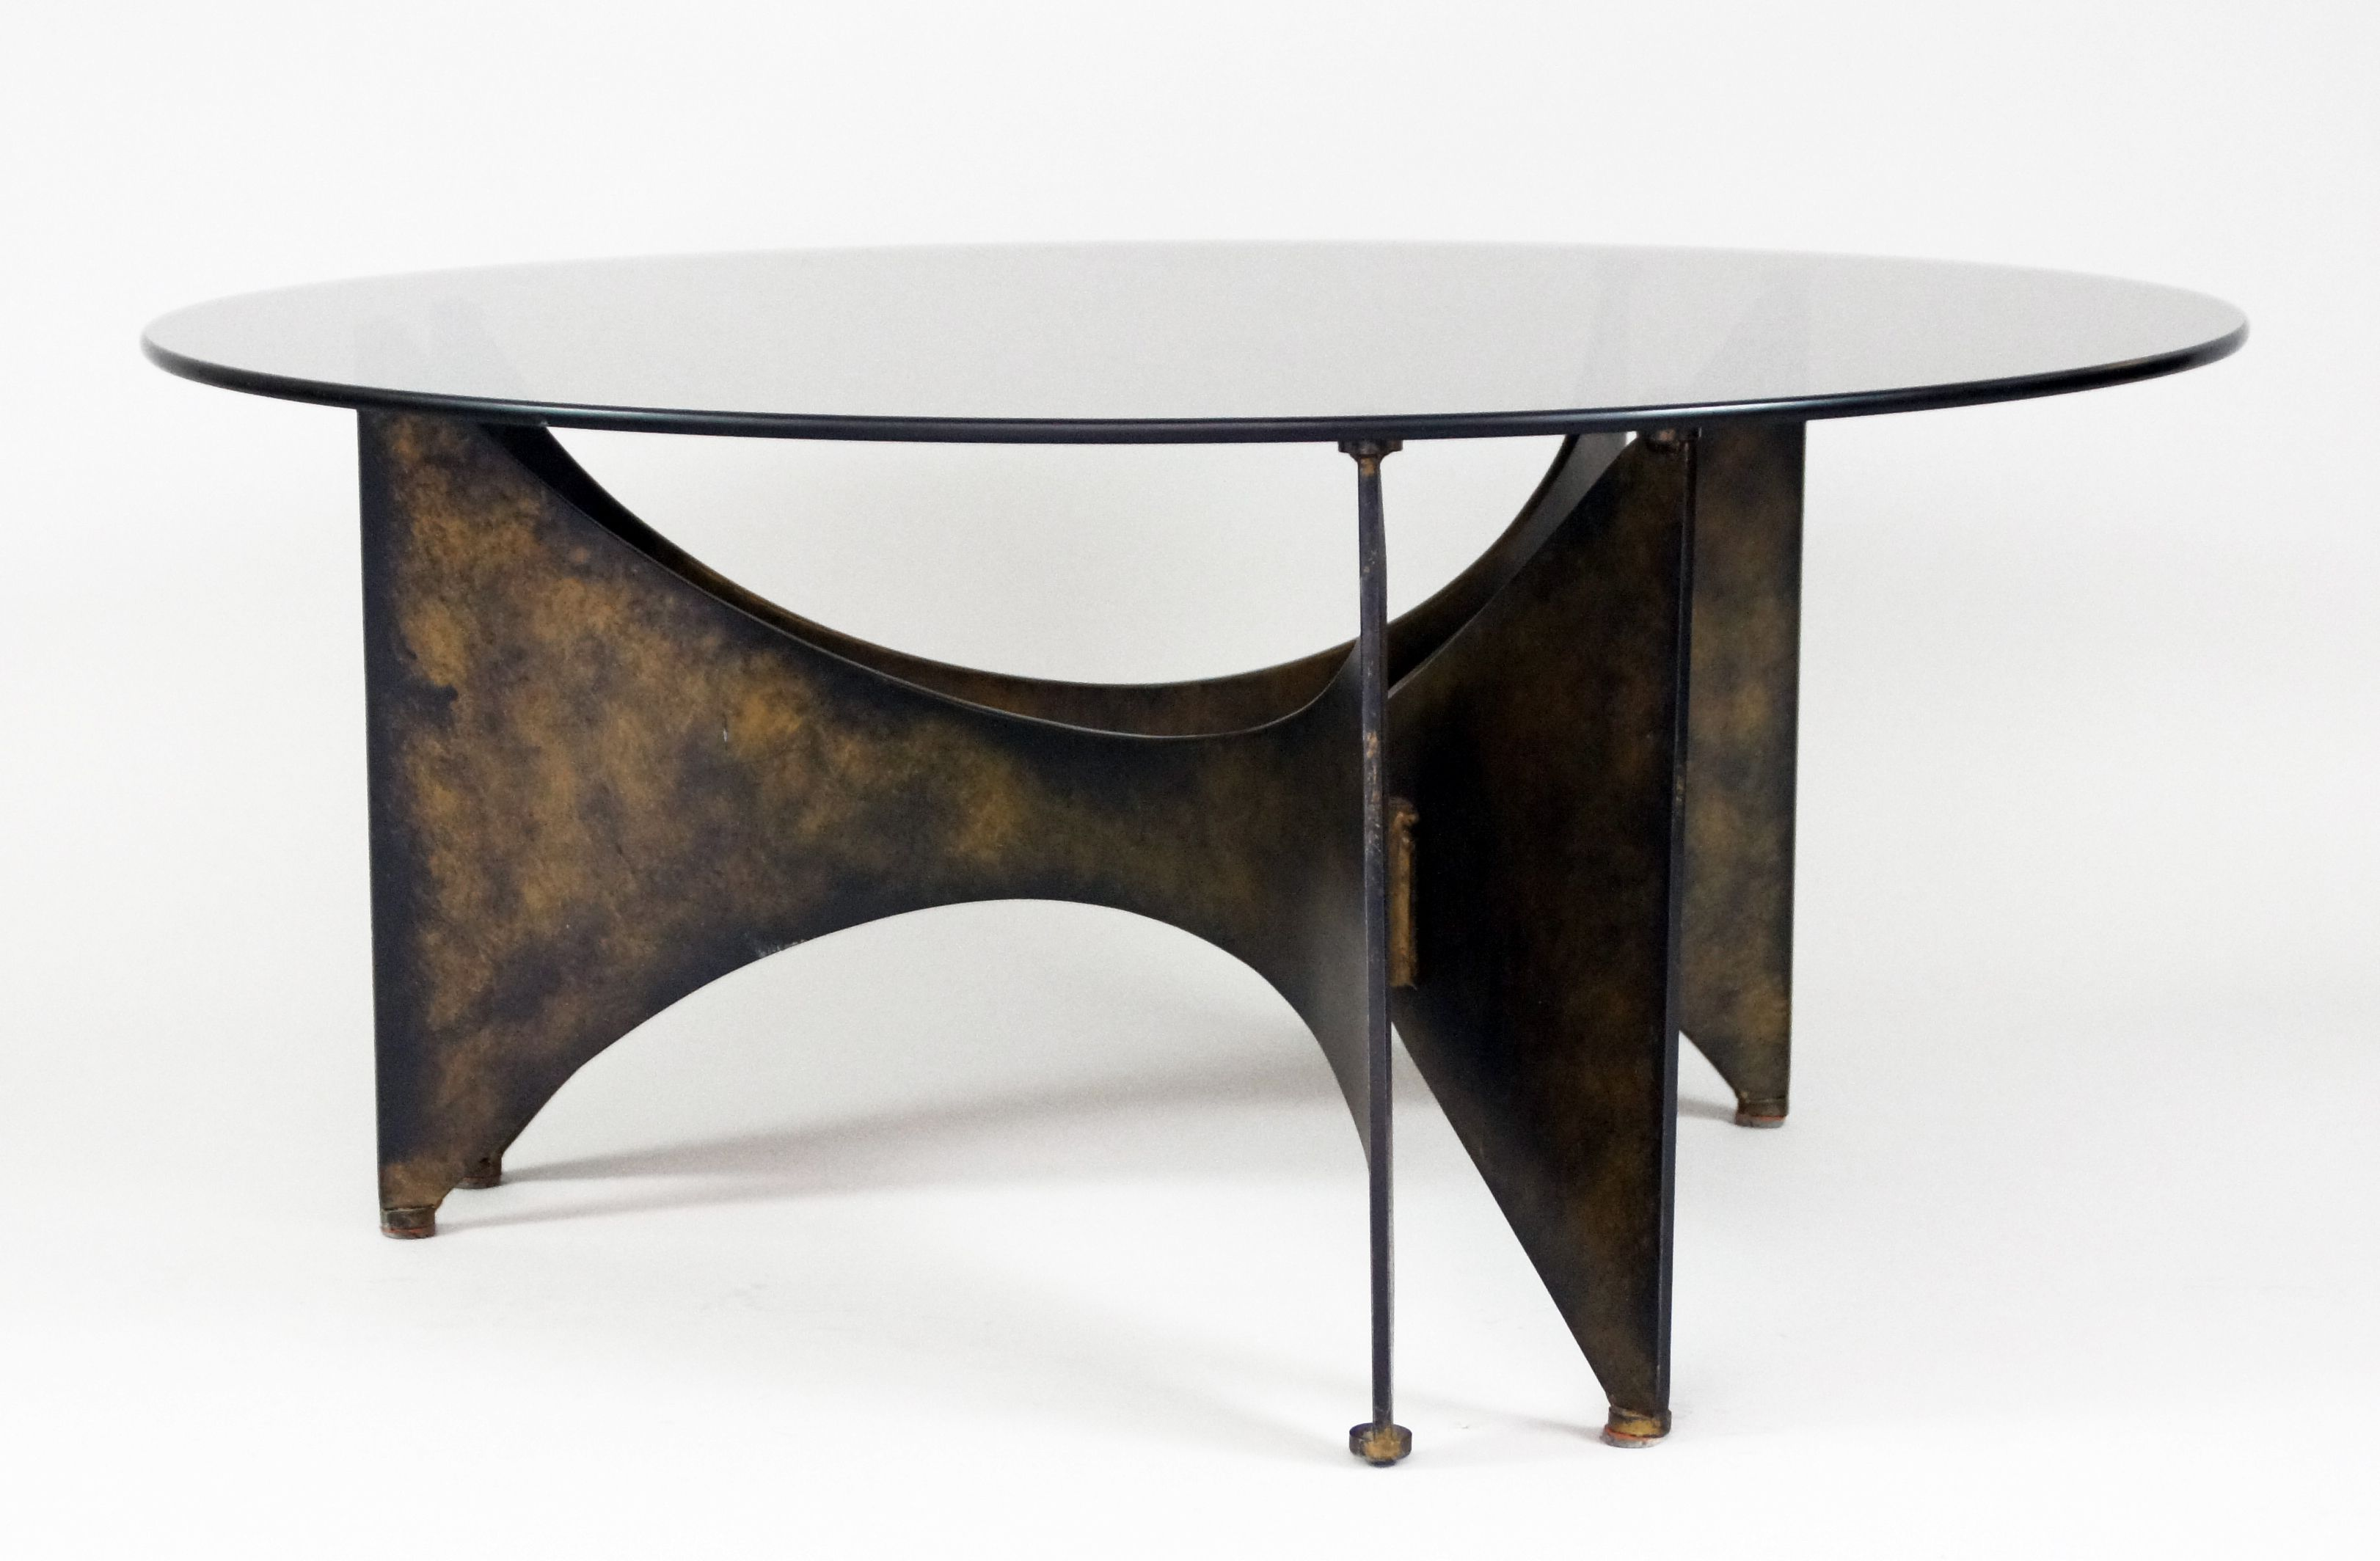 Table basse en bronze et verre. Disponible chez www.collectionofdesign.com